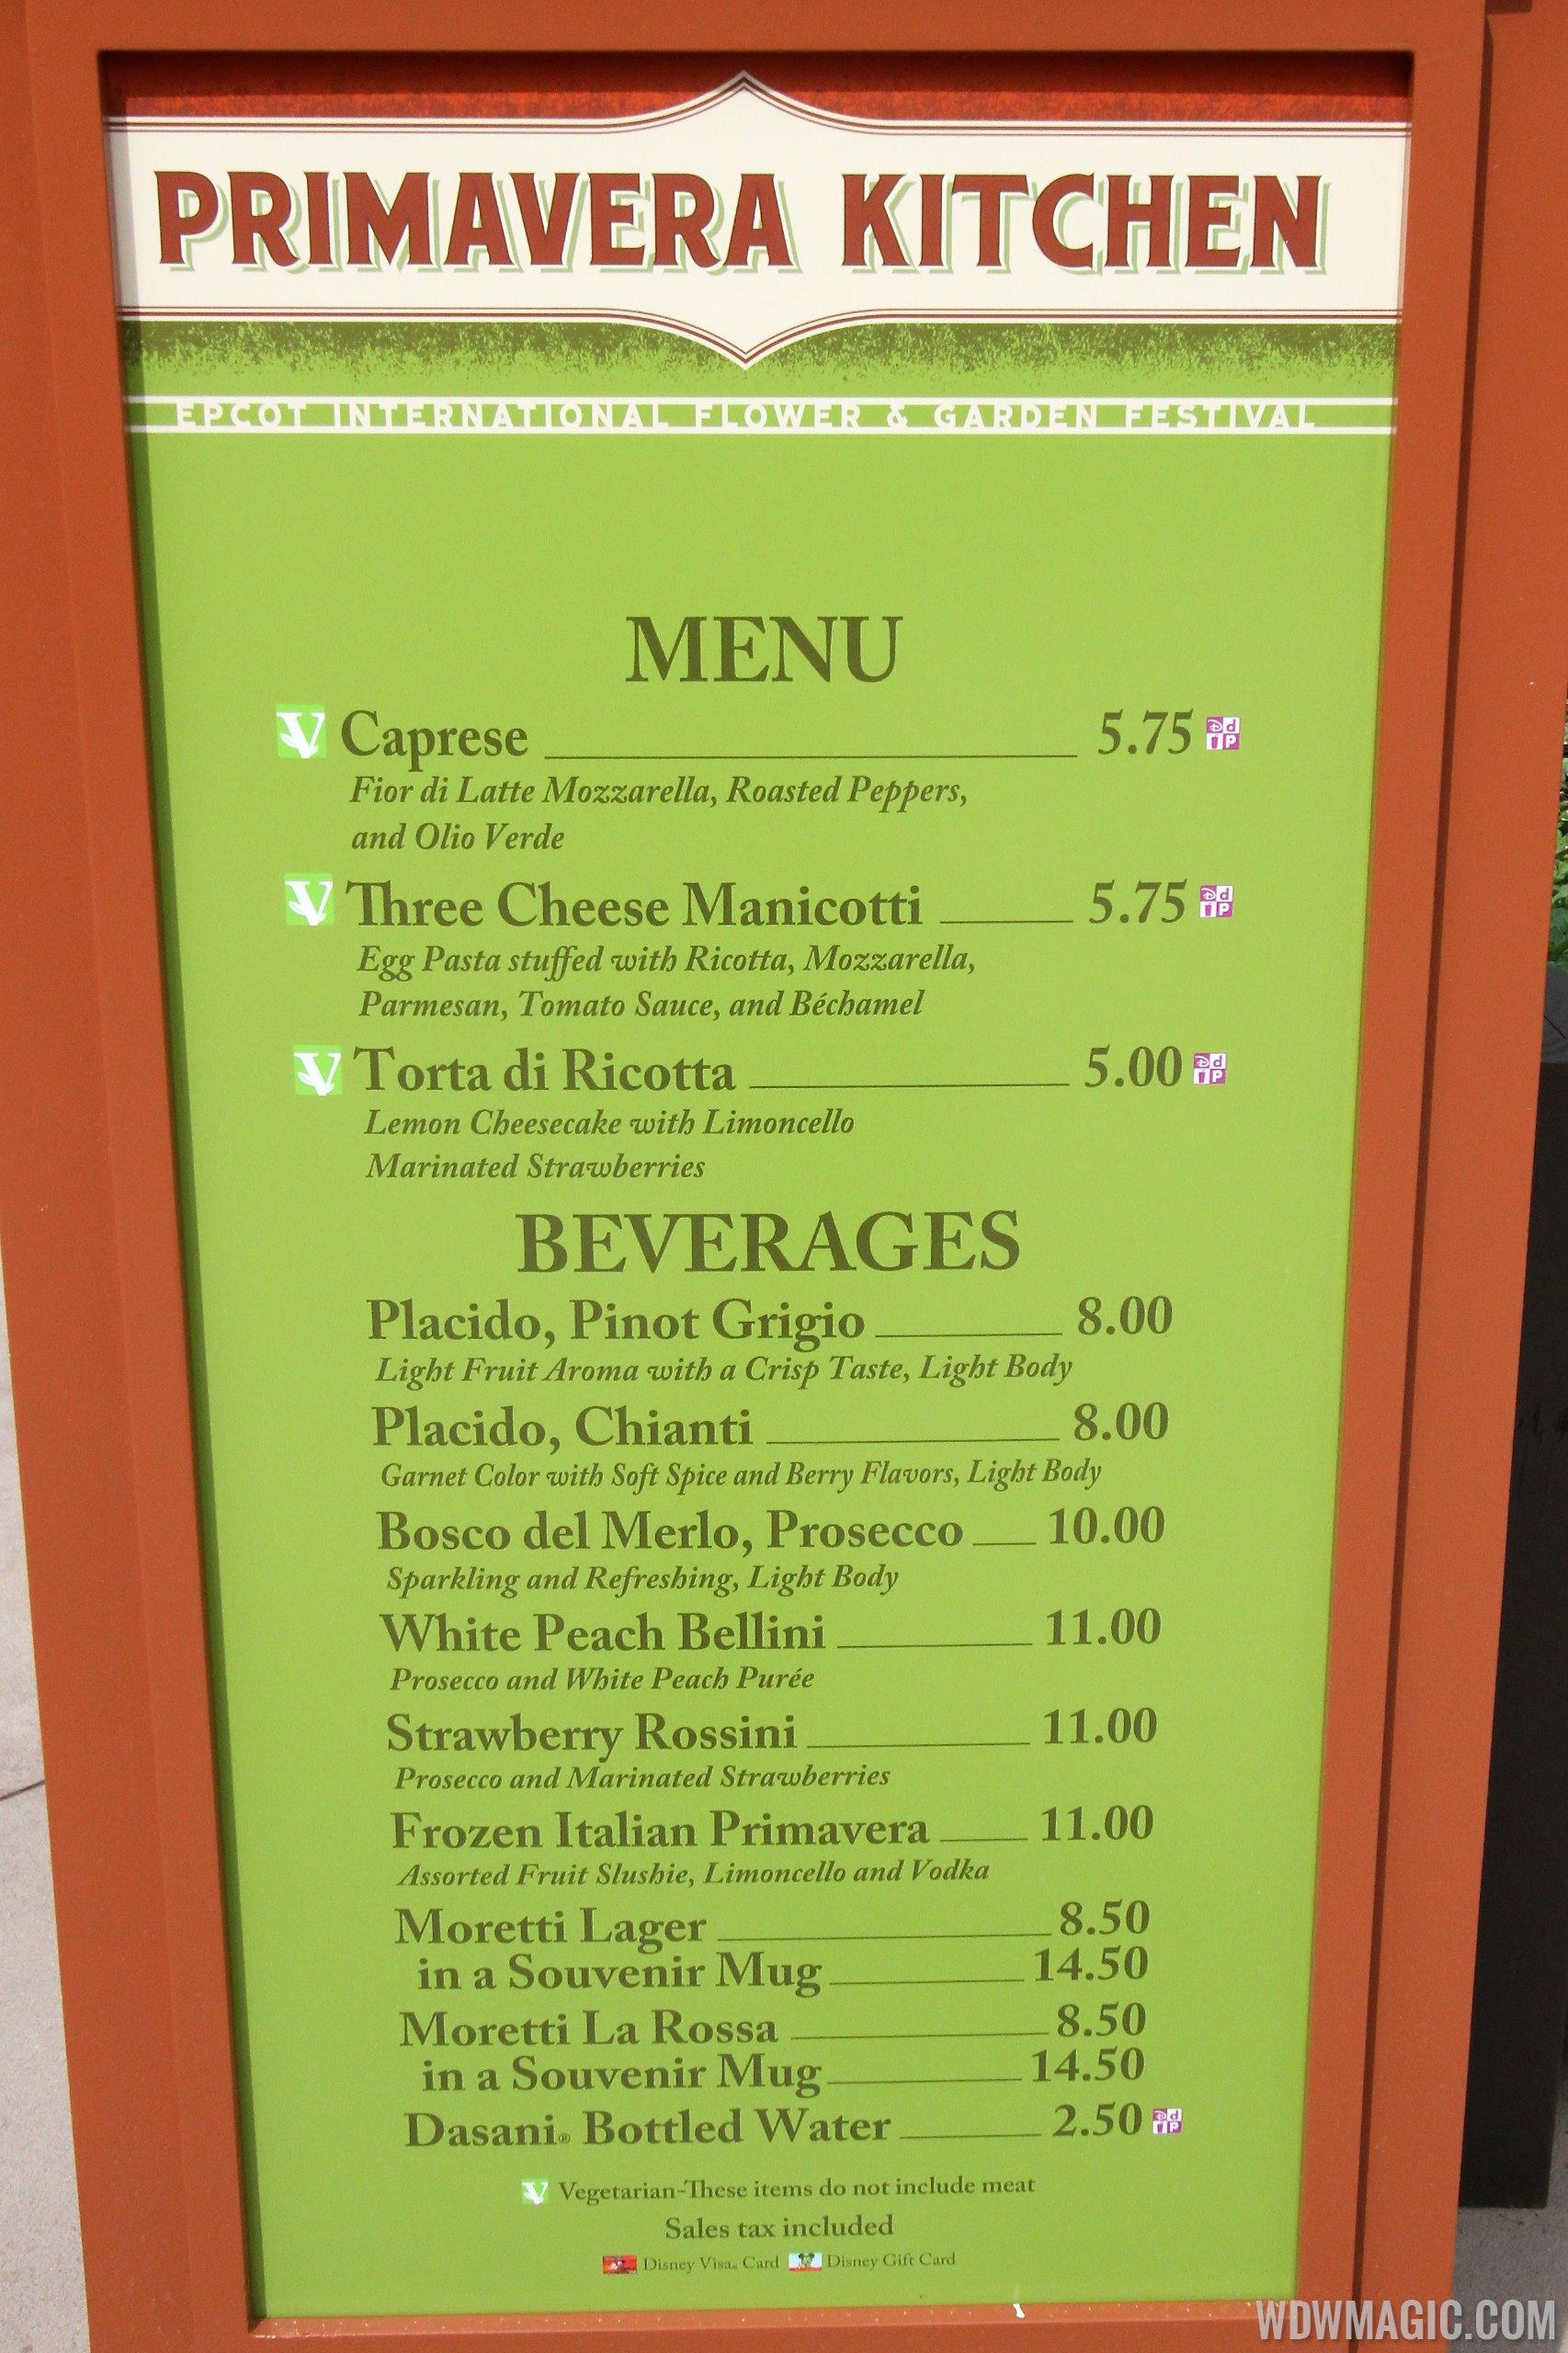 2014 Epcot Flower and Garden Festival Outdoor Kitchen kiosks and menus